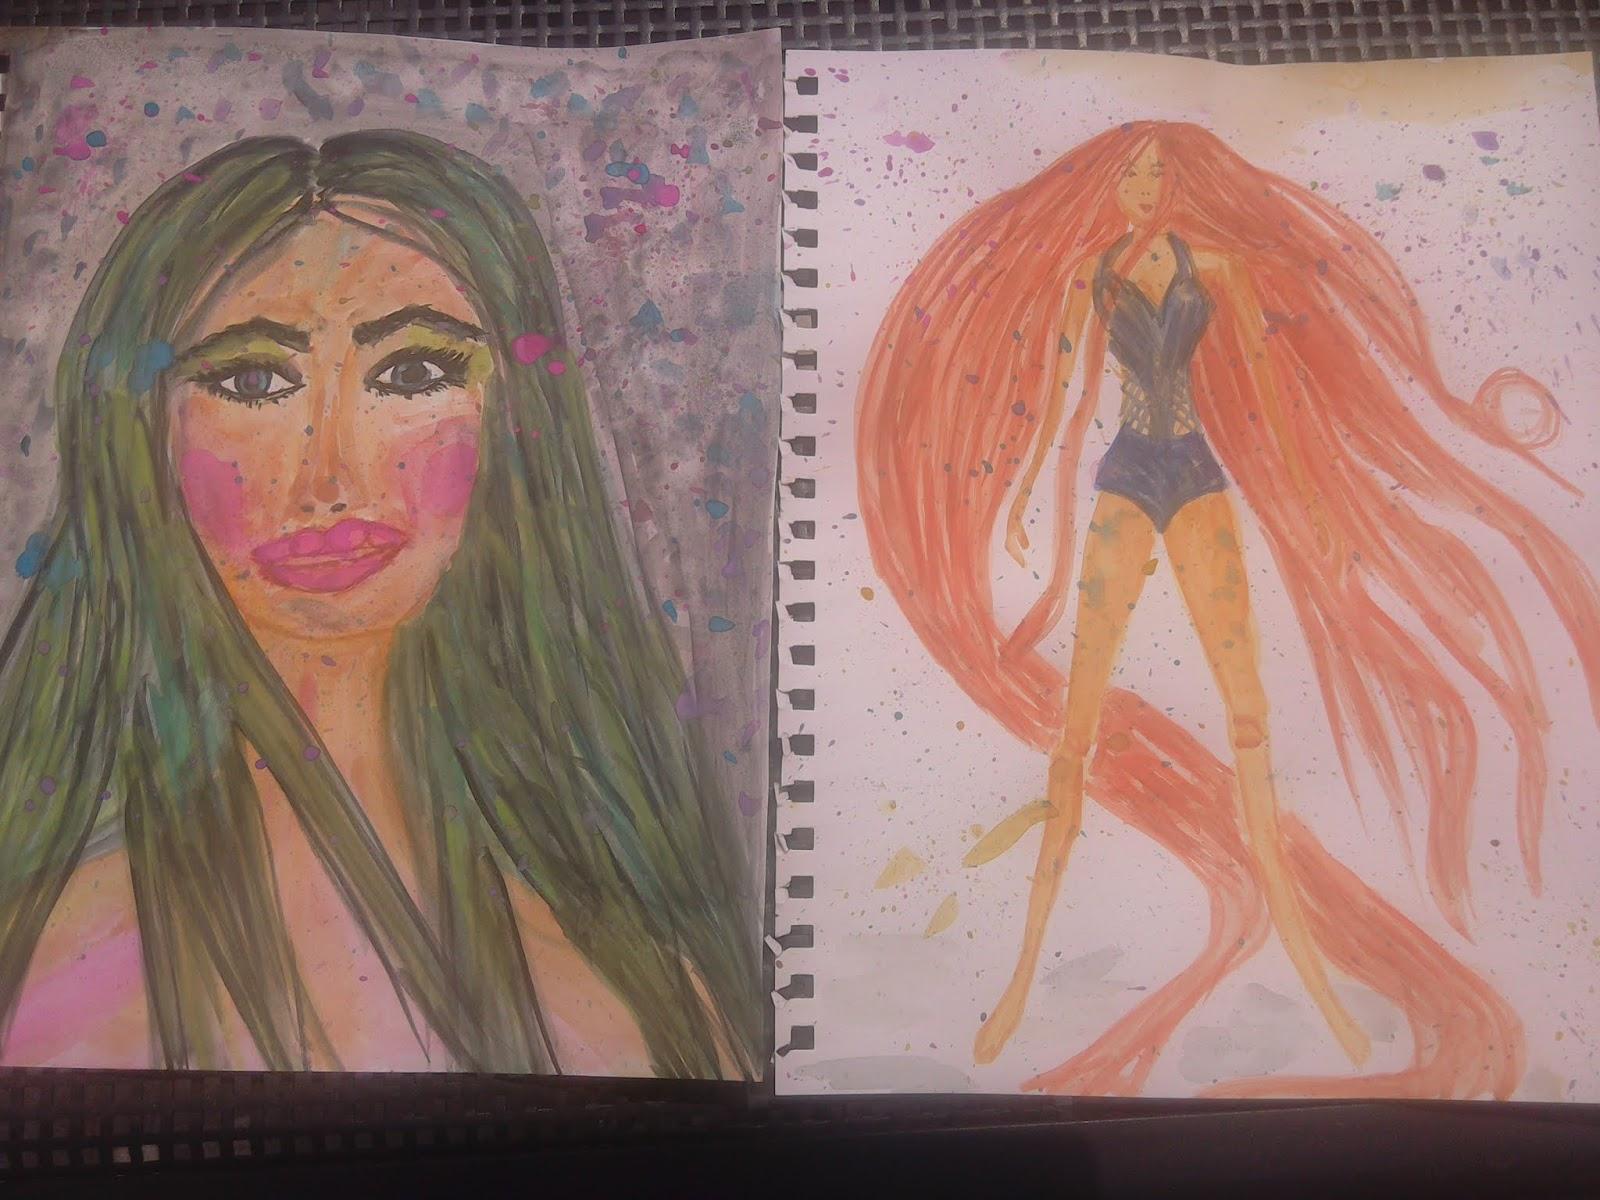 Watercolour Paintings: My Art Lately